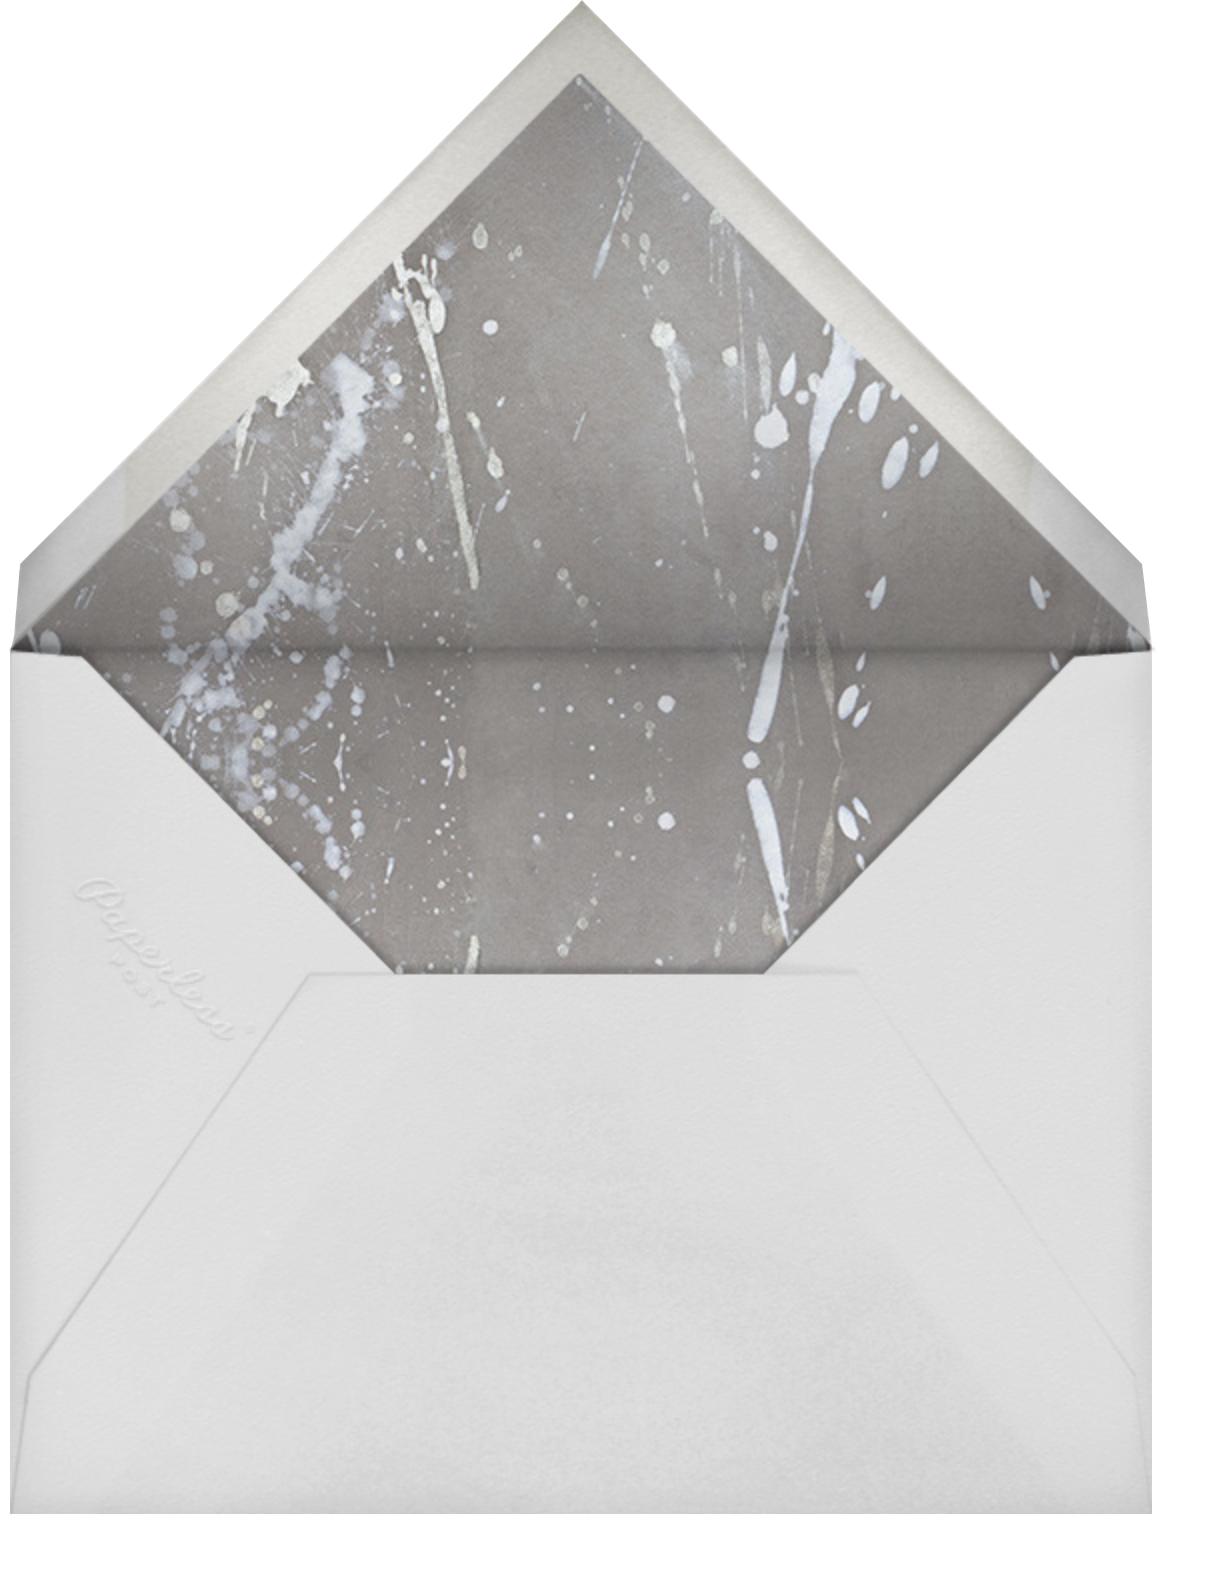 Graffito - Coral - Kelly Wearstler - British Summer Time - envelope back